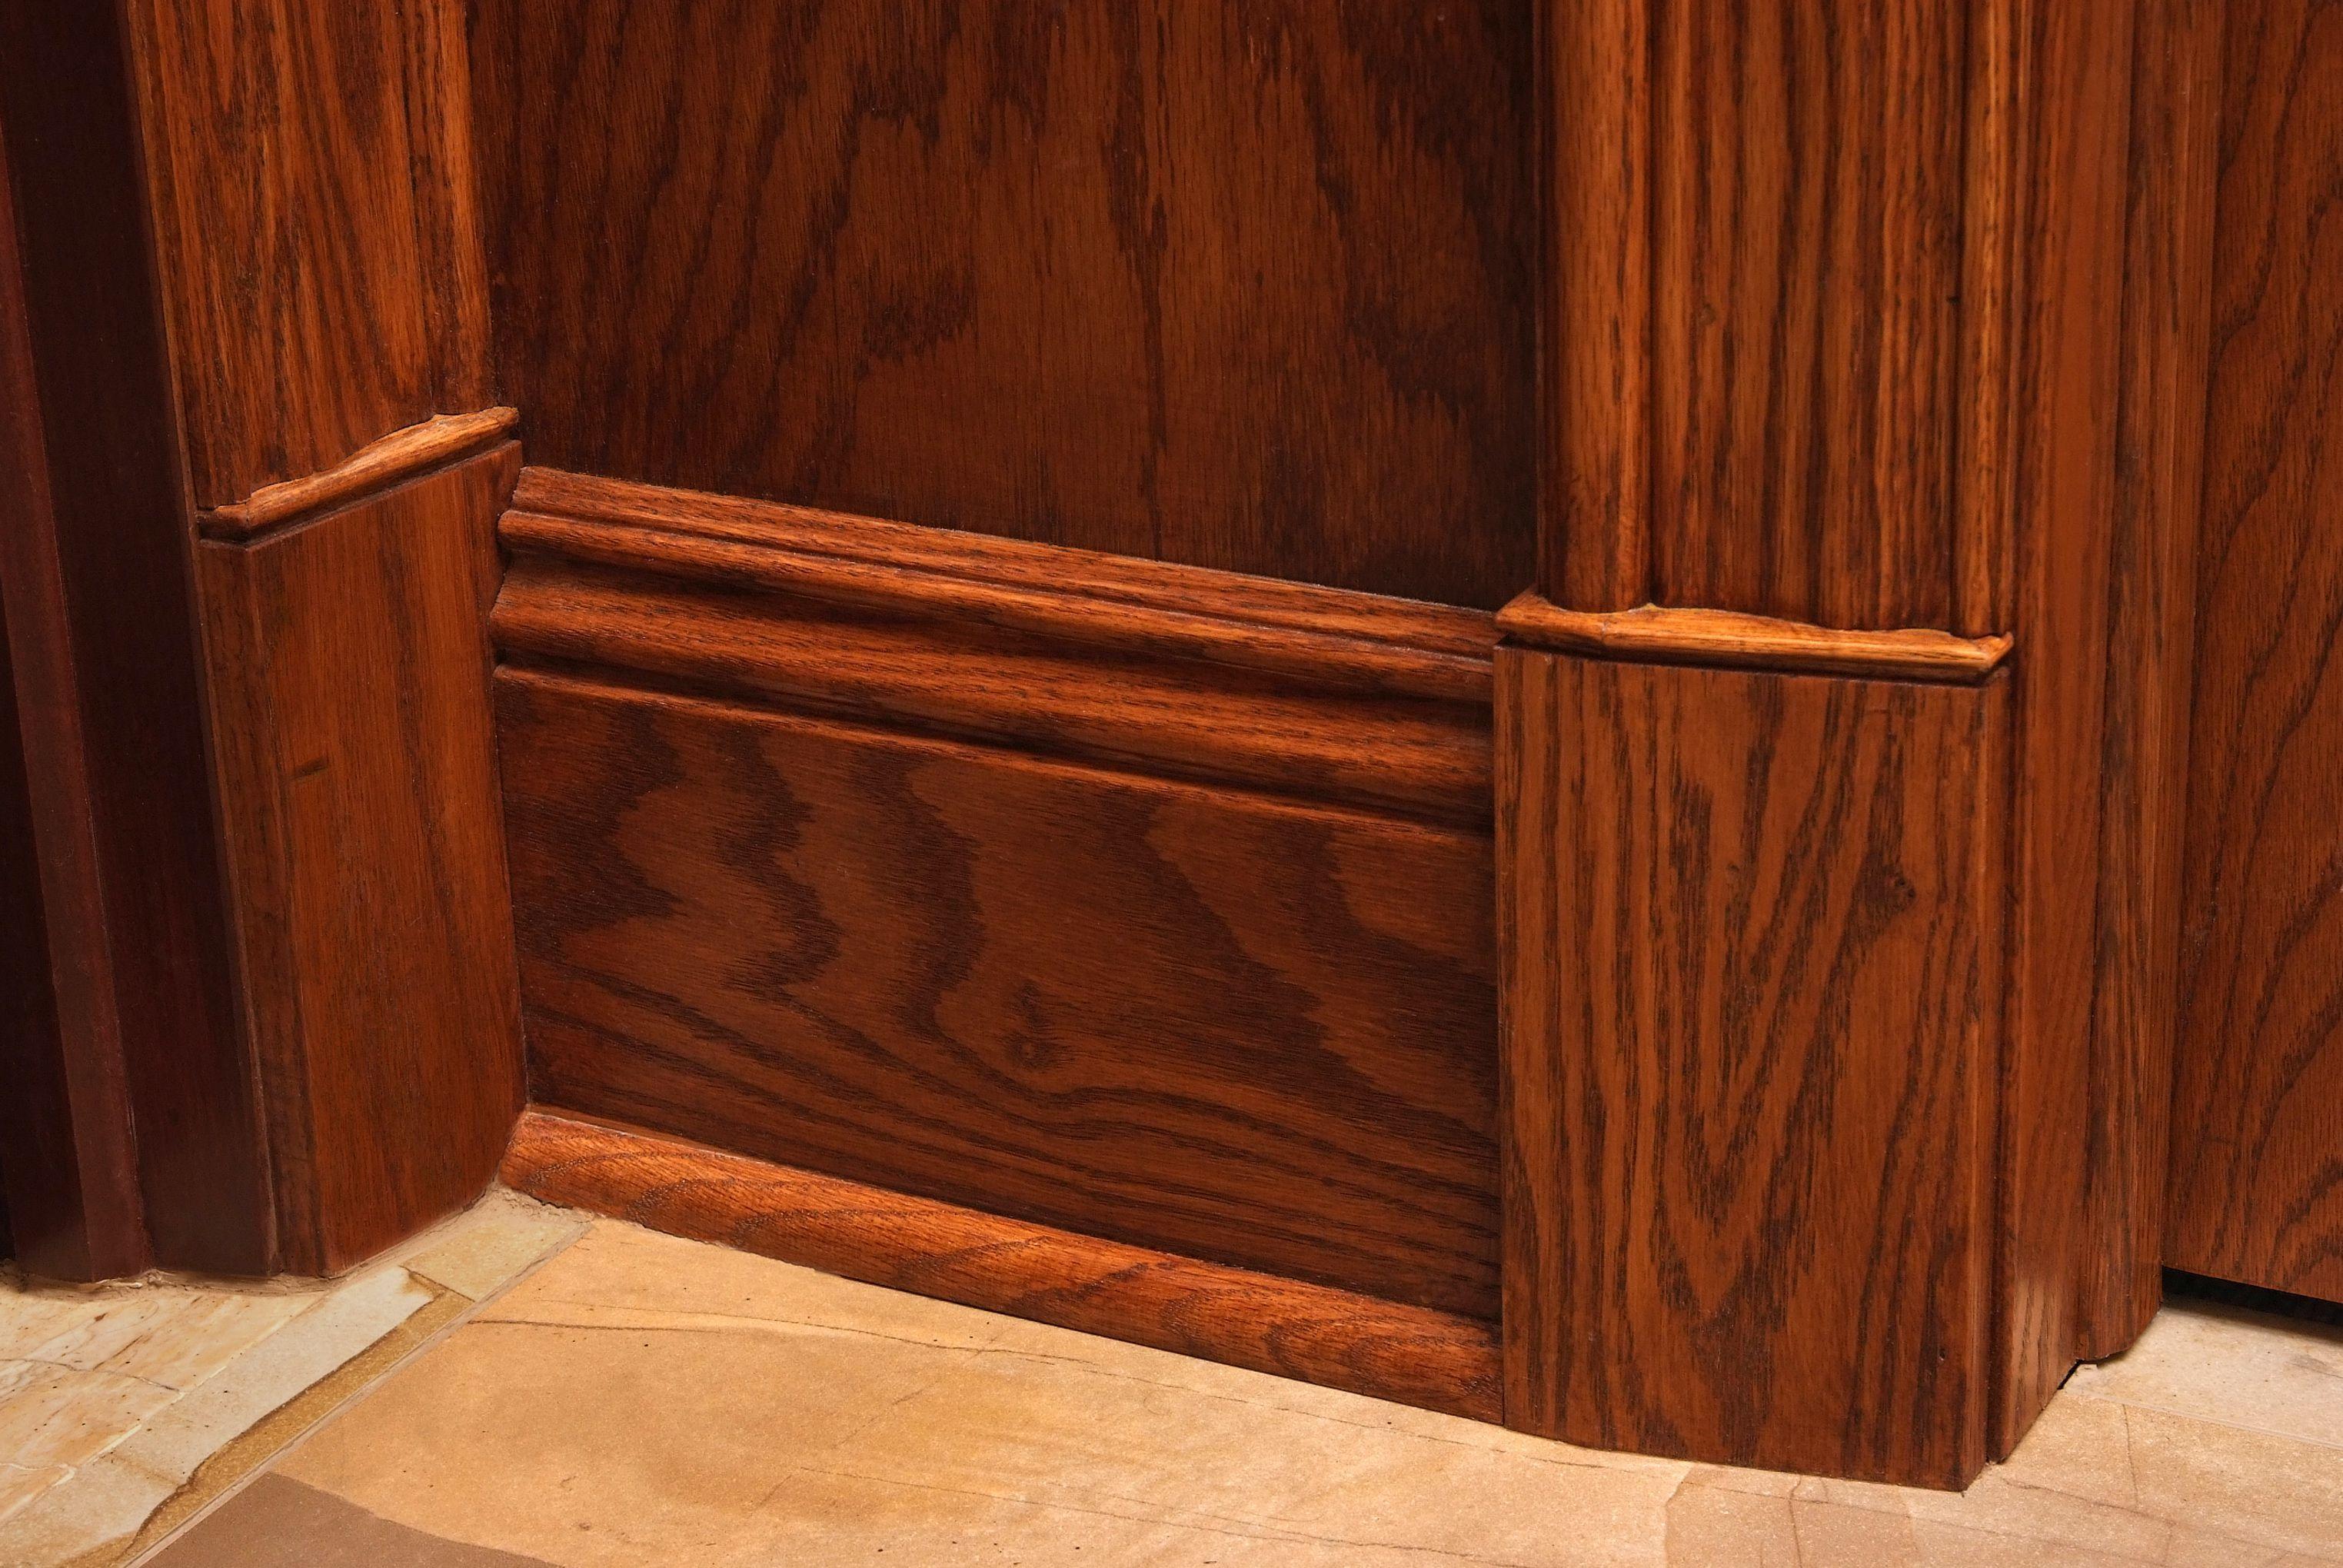 Red Oak Trim Detail With B110 1 16 X 4 Casing B212 3 7 2 Baseboard B001 Shoe Moulding And Custom Base Blocks